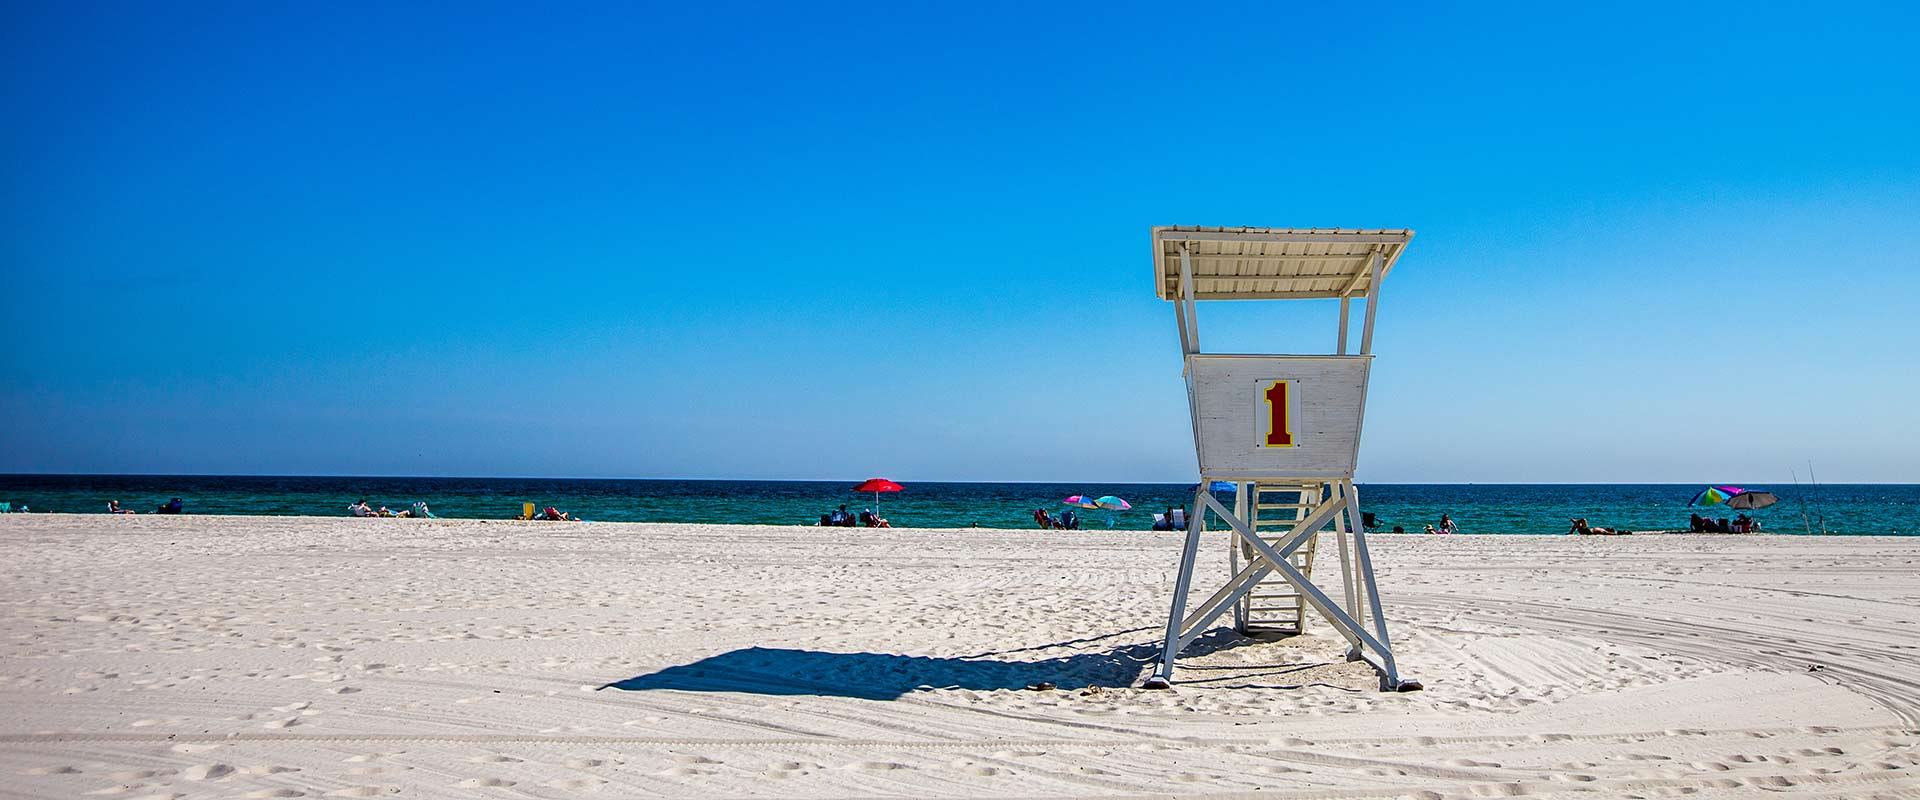 Lifeguard Stand on Orange Beach, Alabama